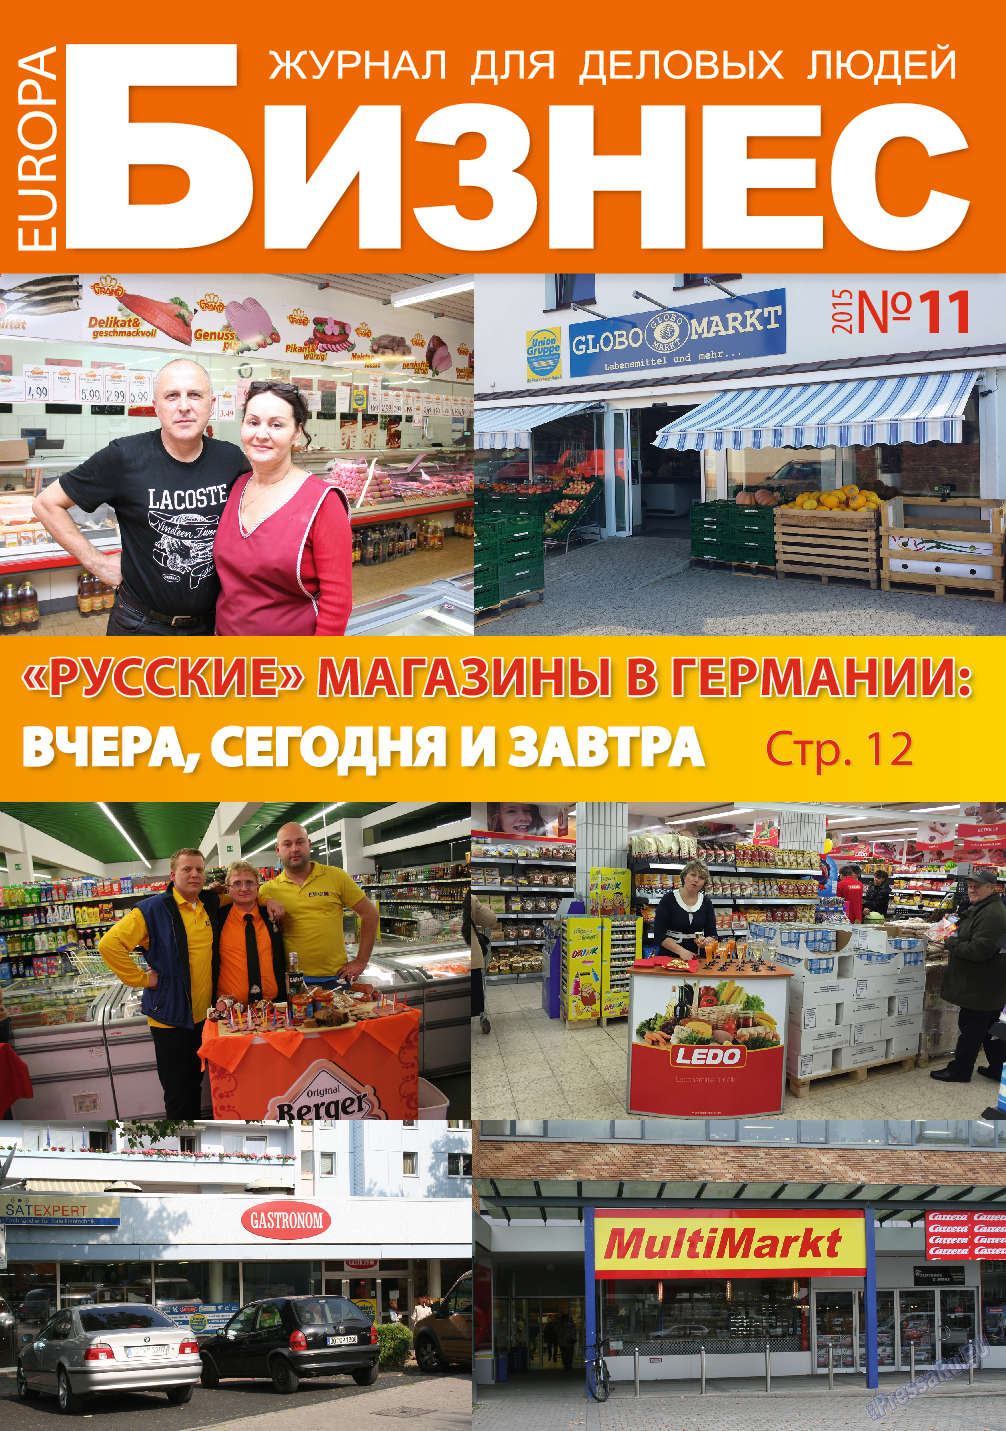 Бизнес (журнал). 2015 год, номер 11, стр. 1